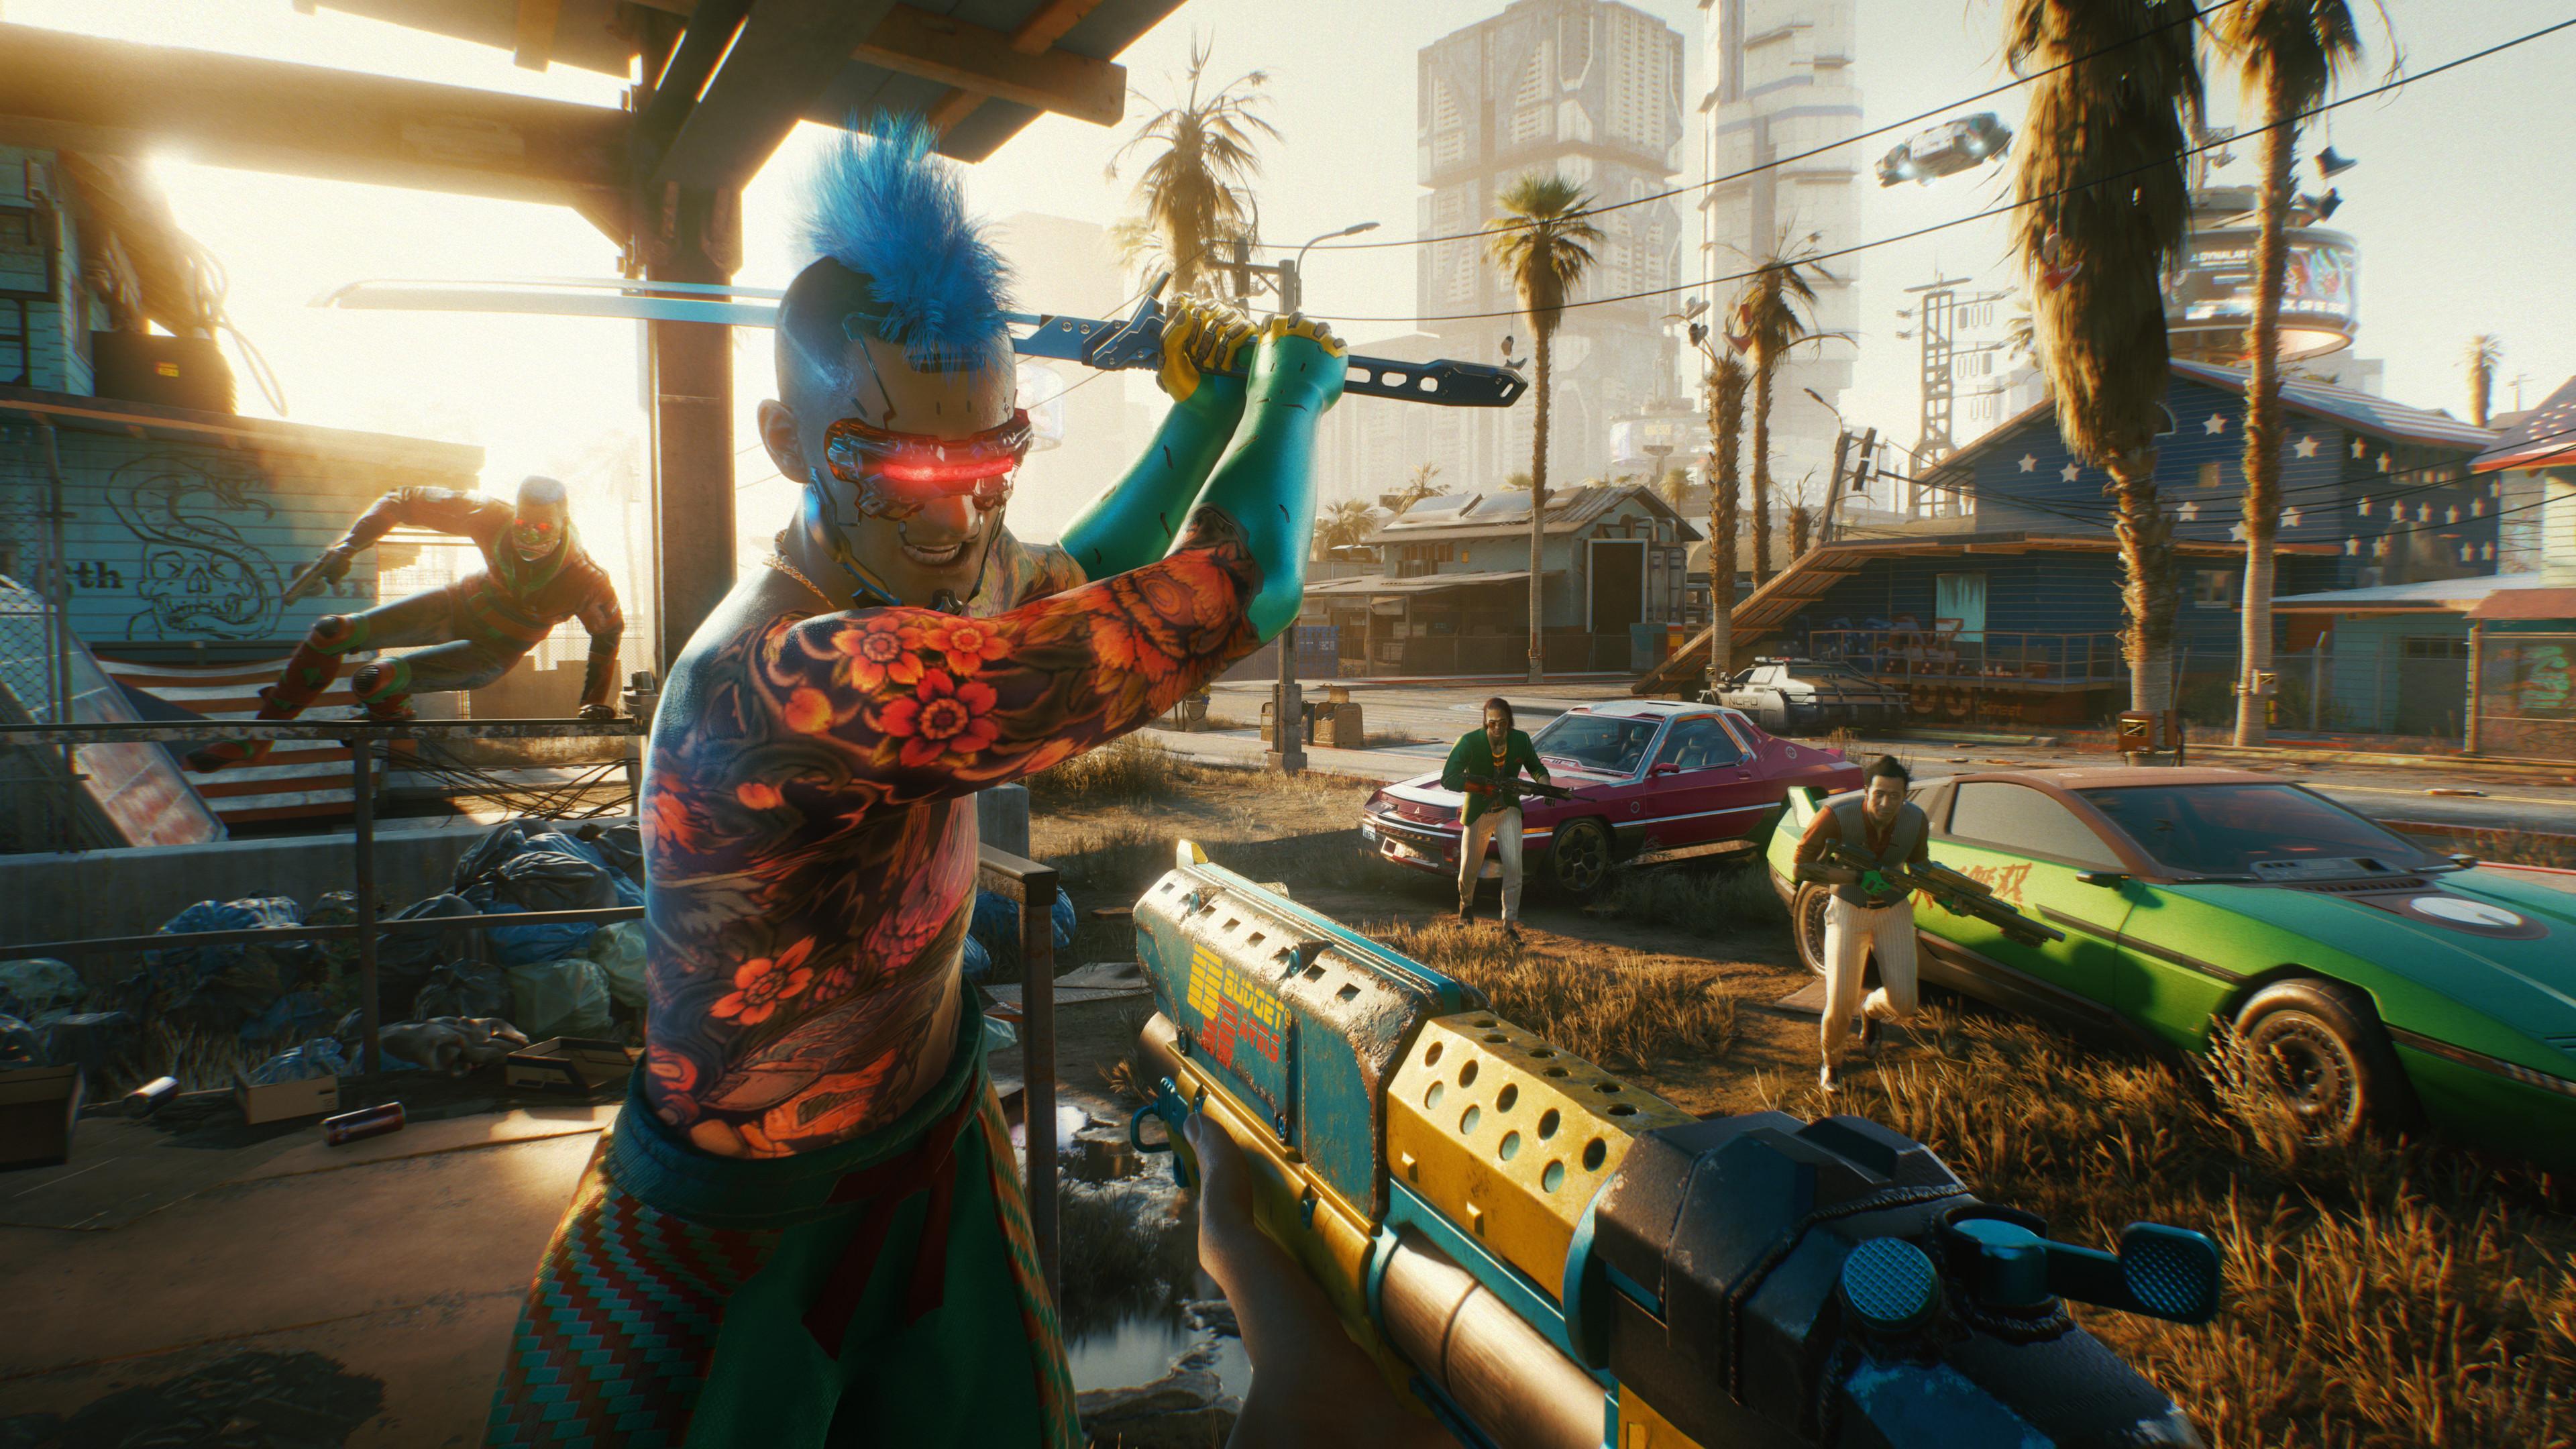 A futuristic blue-haired punk attacks with a sword in Cyberpunk 2077